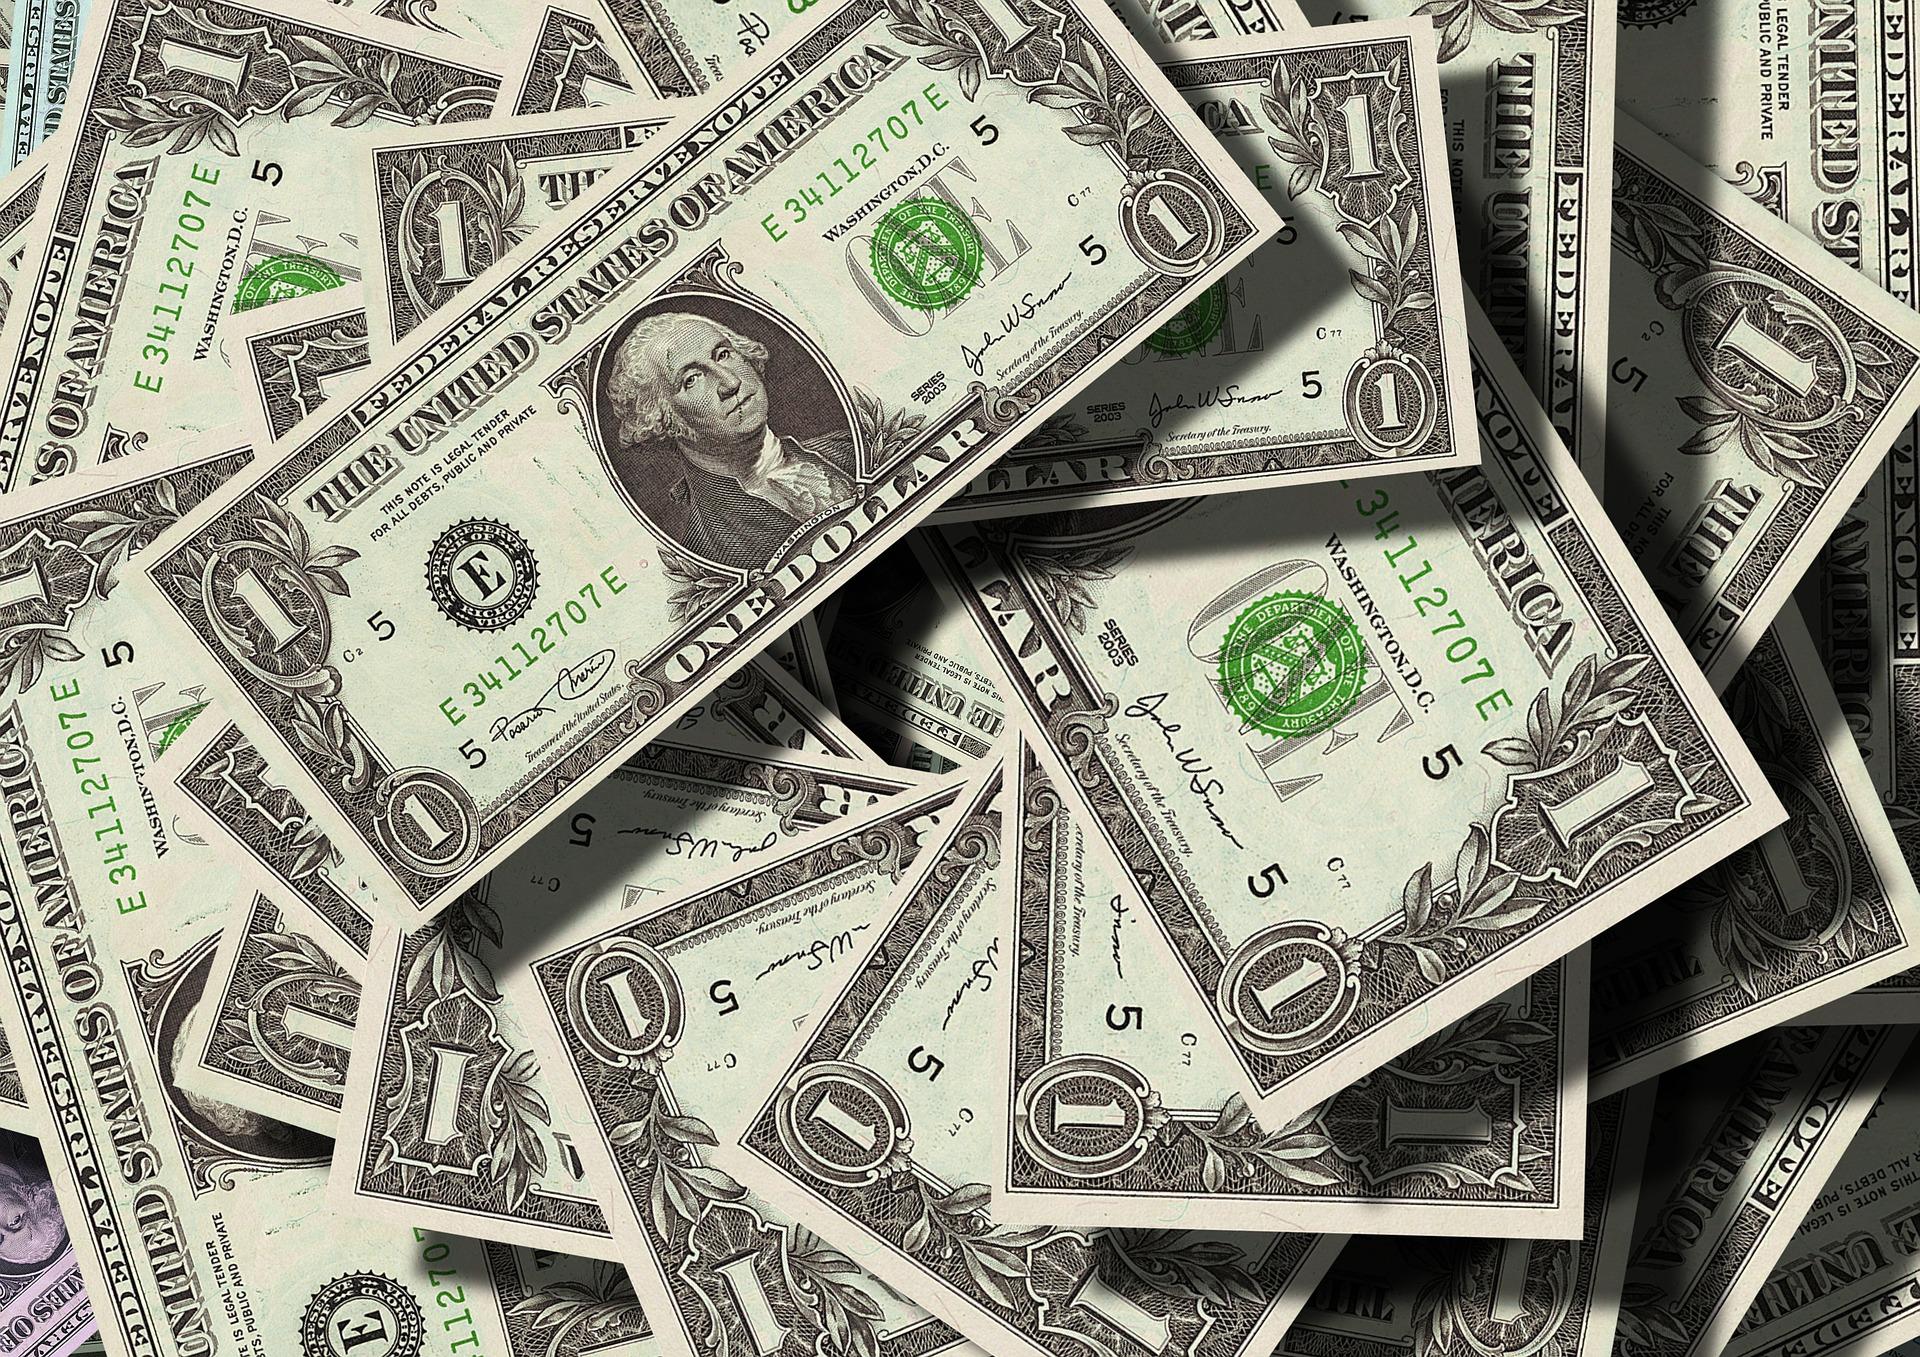 Crypto custodian Cobo raises $40 million to expand DeFi-as-a-service